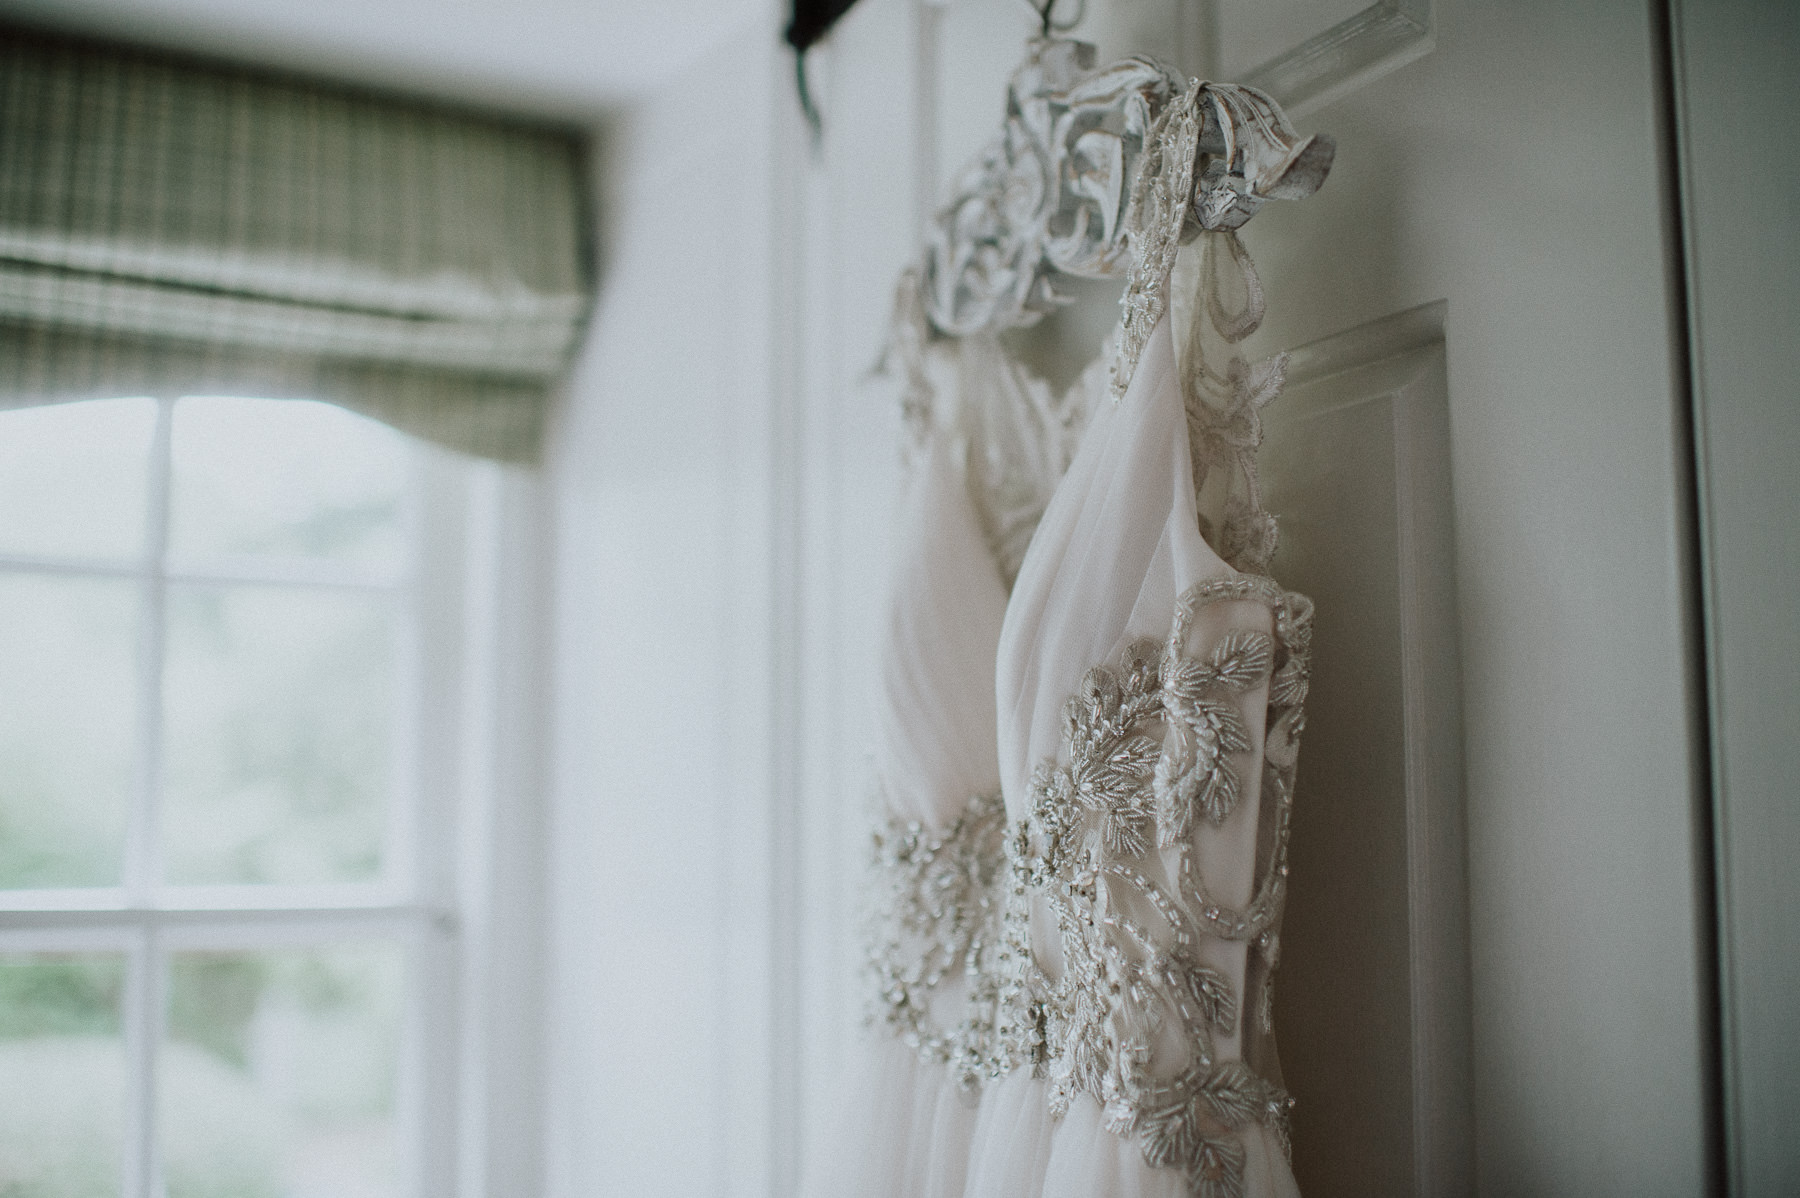 appleford-estate-wedding-photography-13.jpg